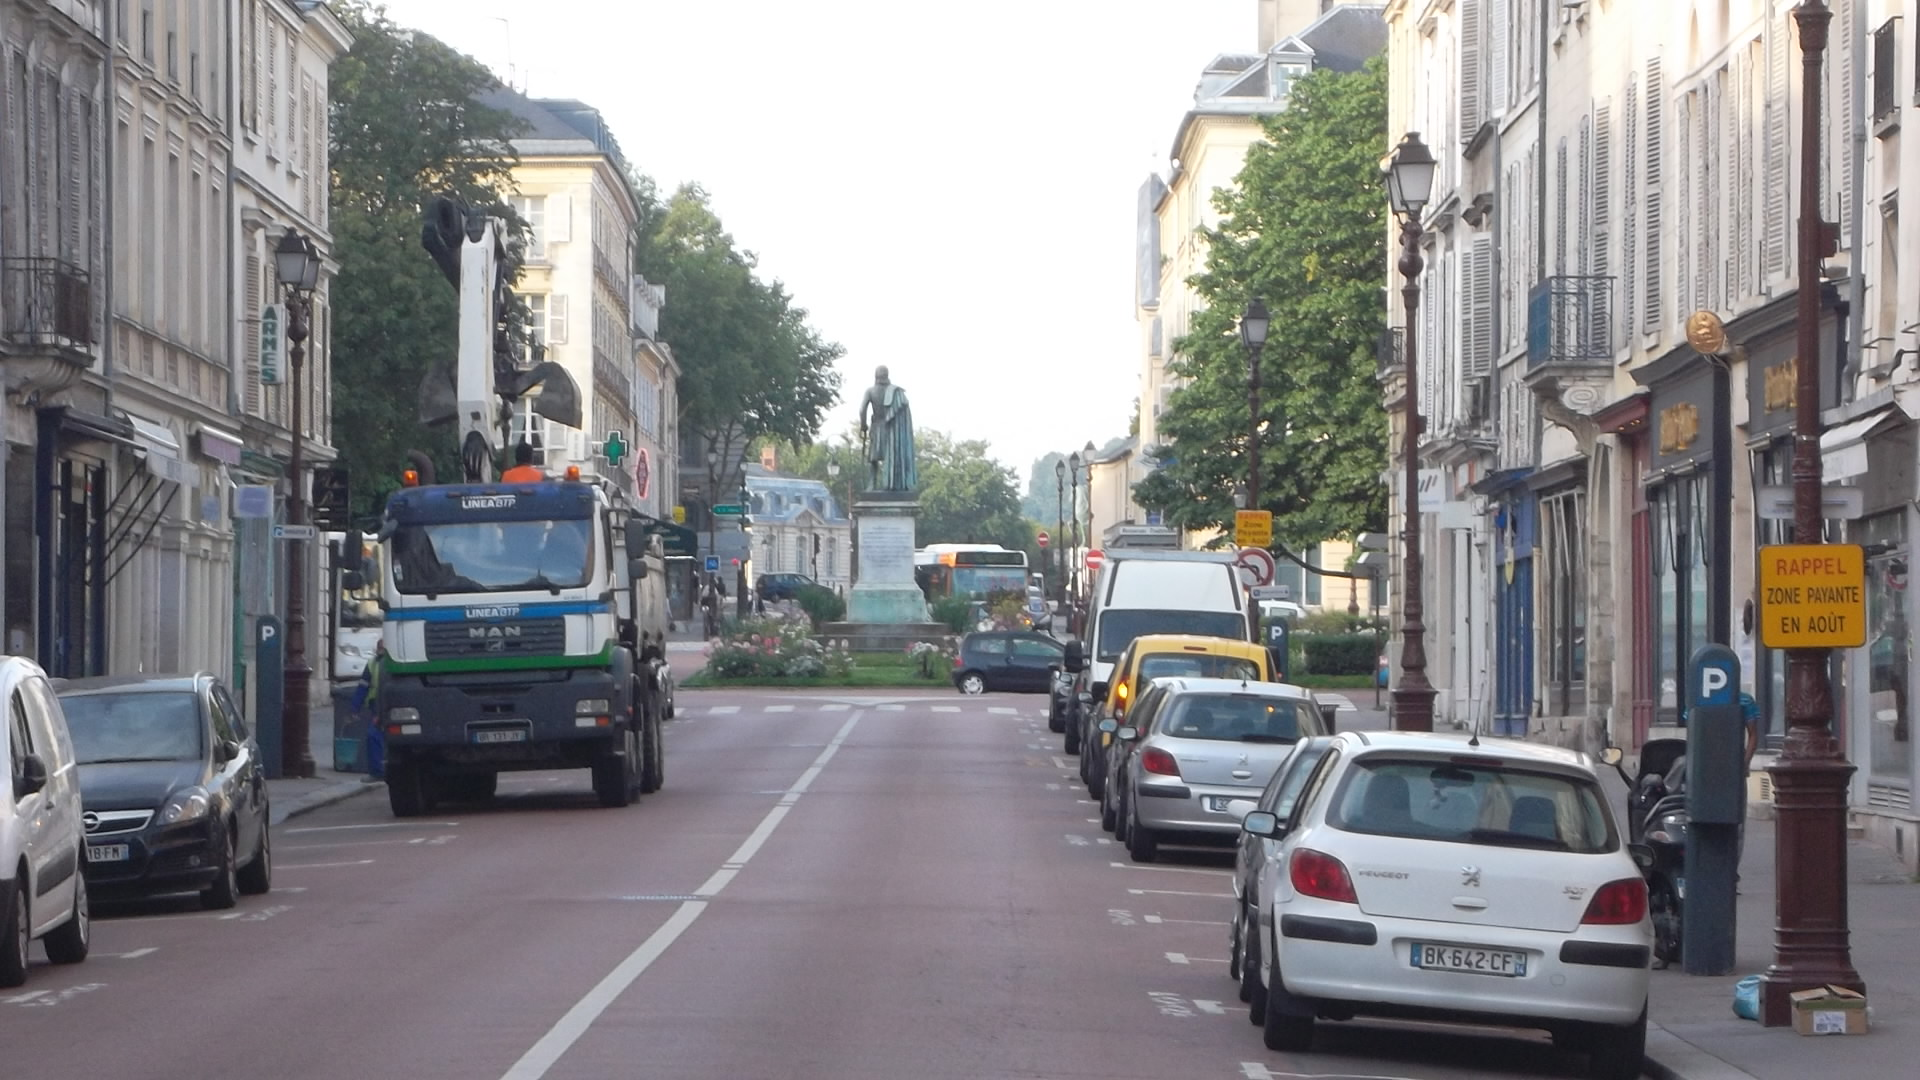 versailles-rue-hoche-to-statue-gen-hoche-and-castle-aug12